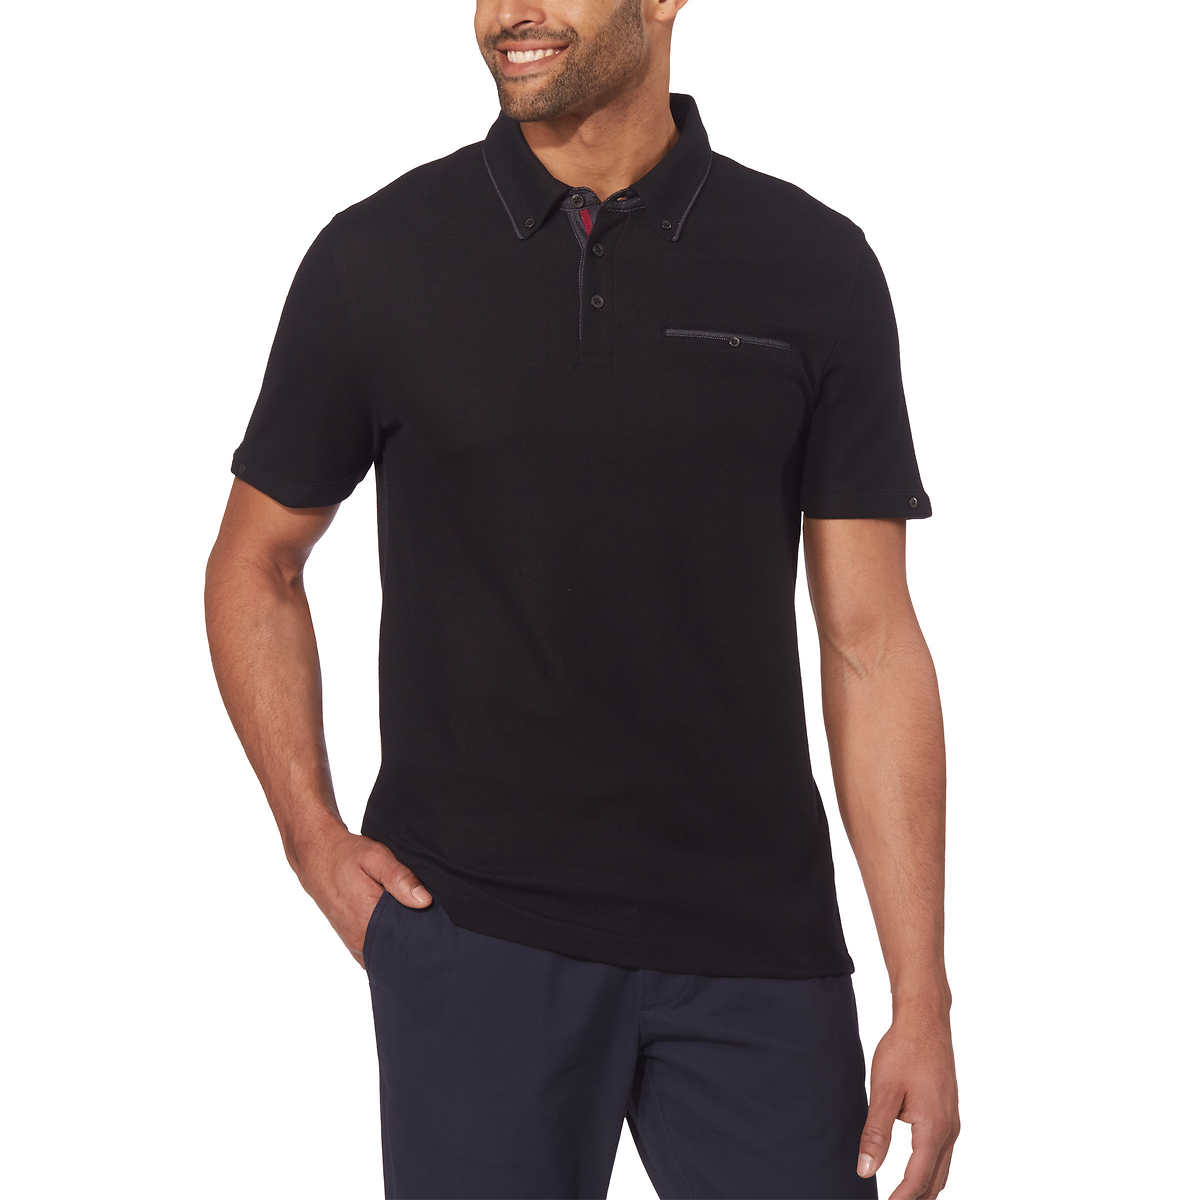 0bc6dfefde40 English Laundry Men's Short Sleeve Polo